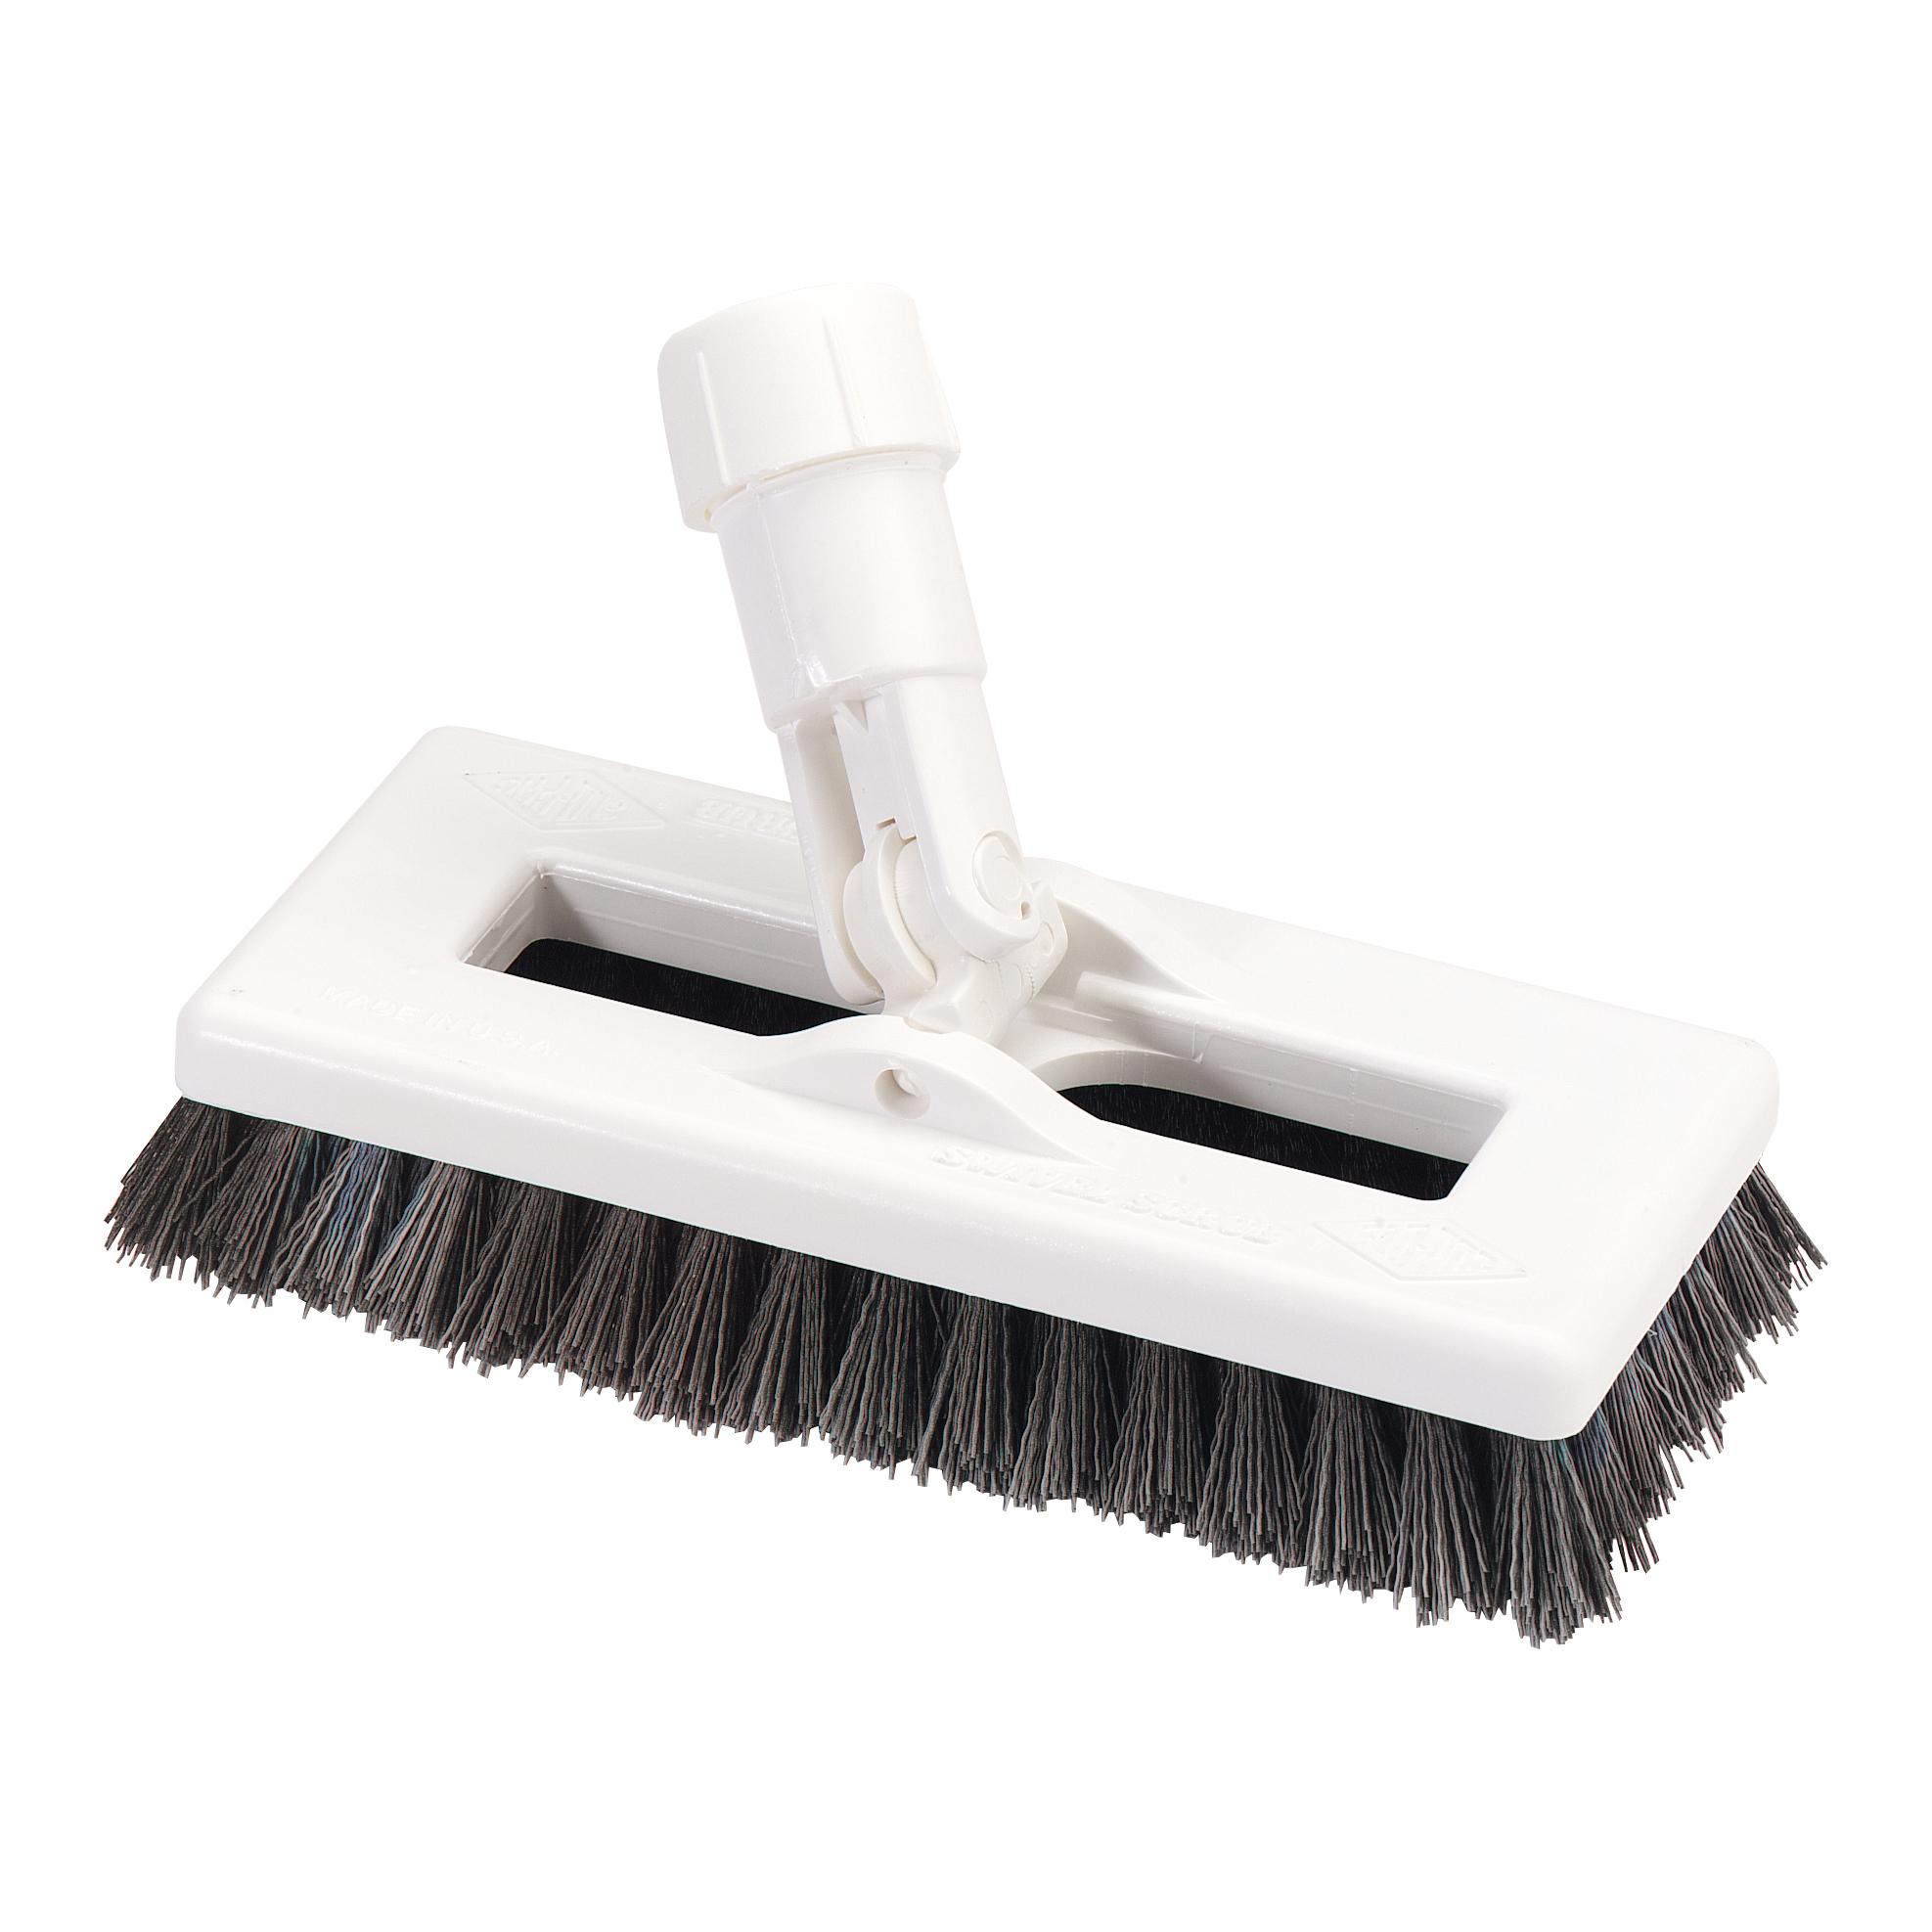 Carlisle 363883103 brush, floor